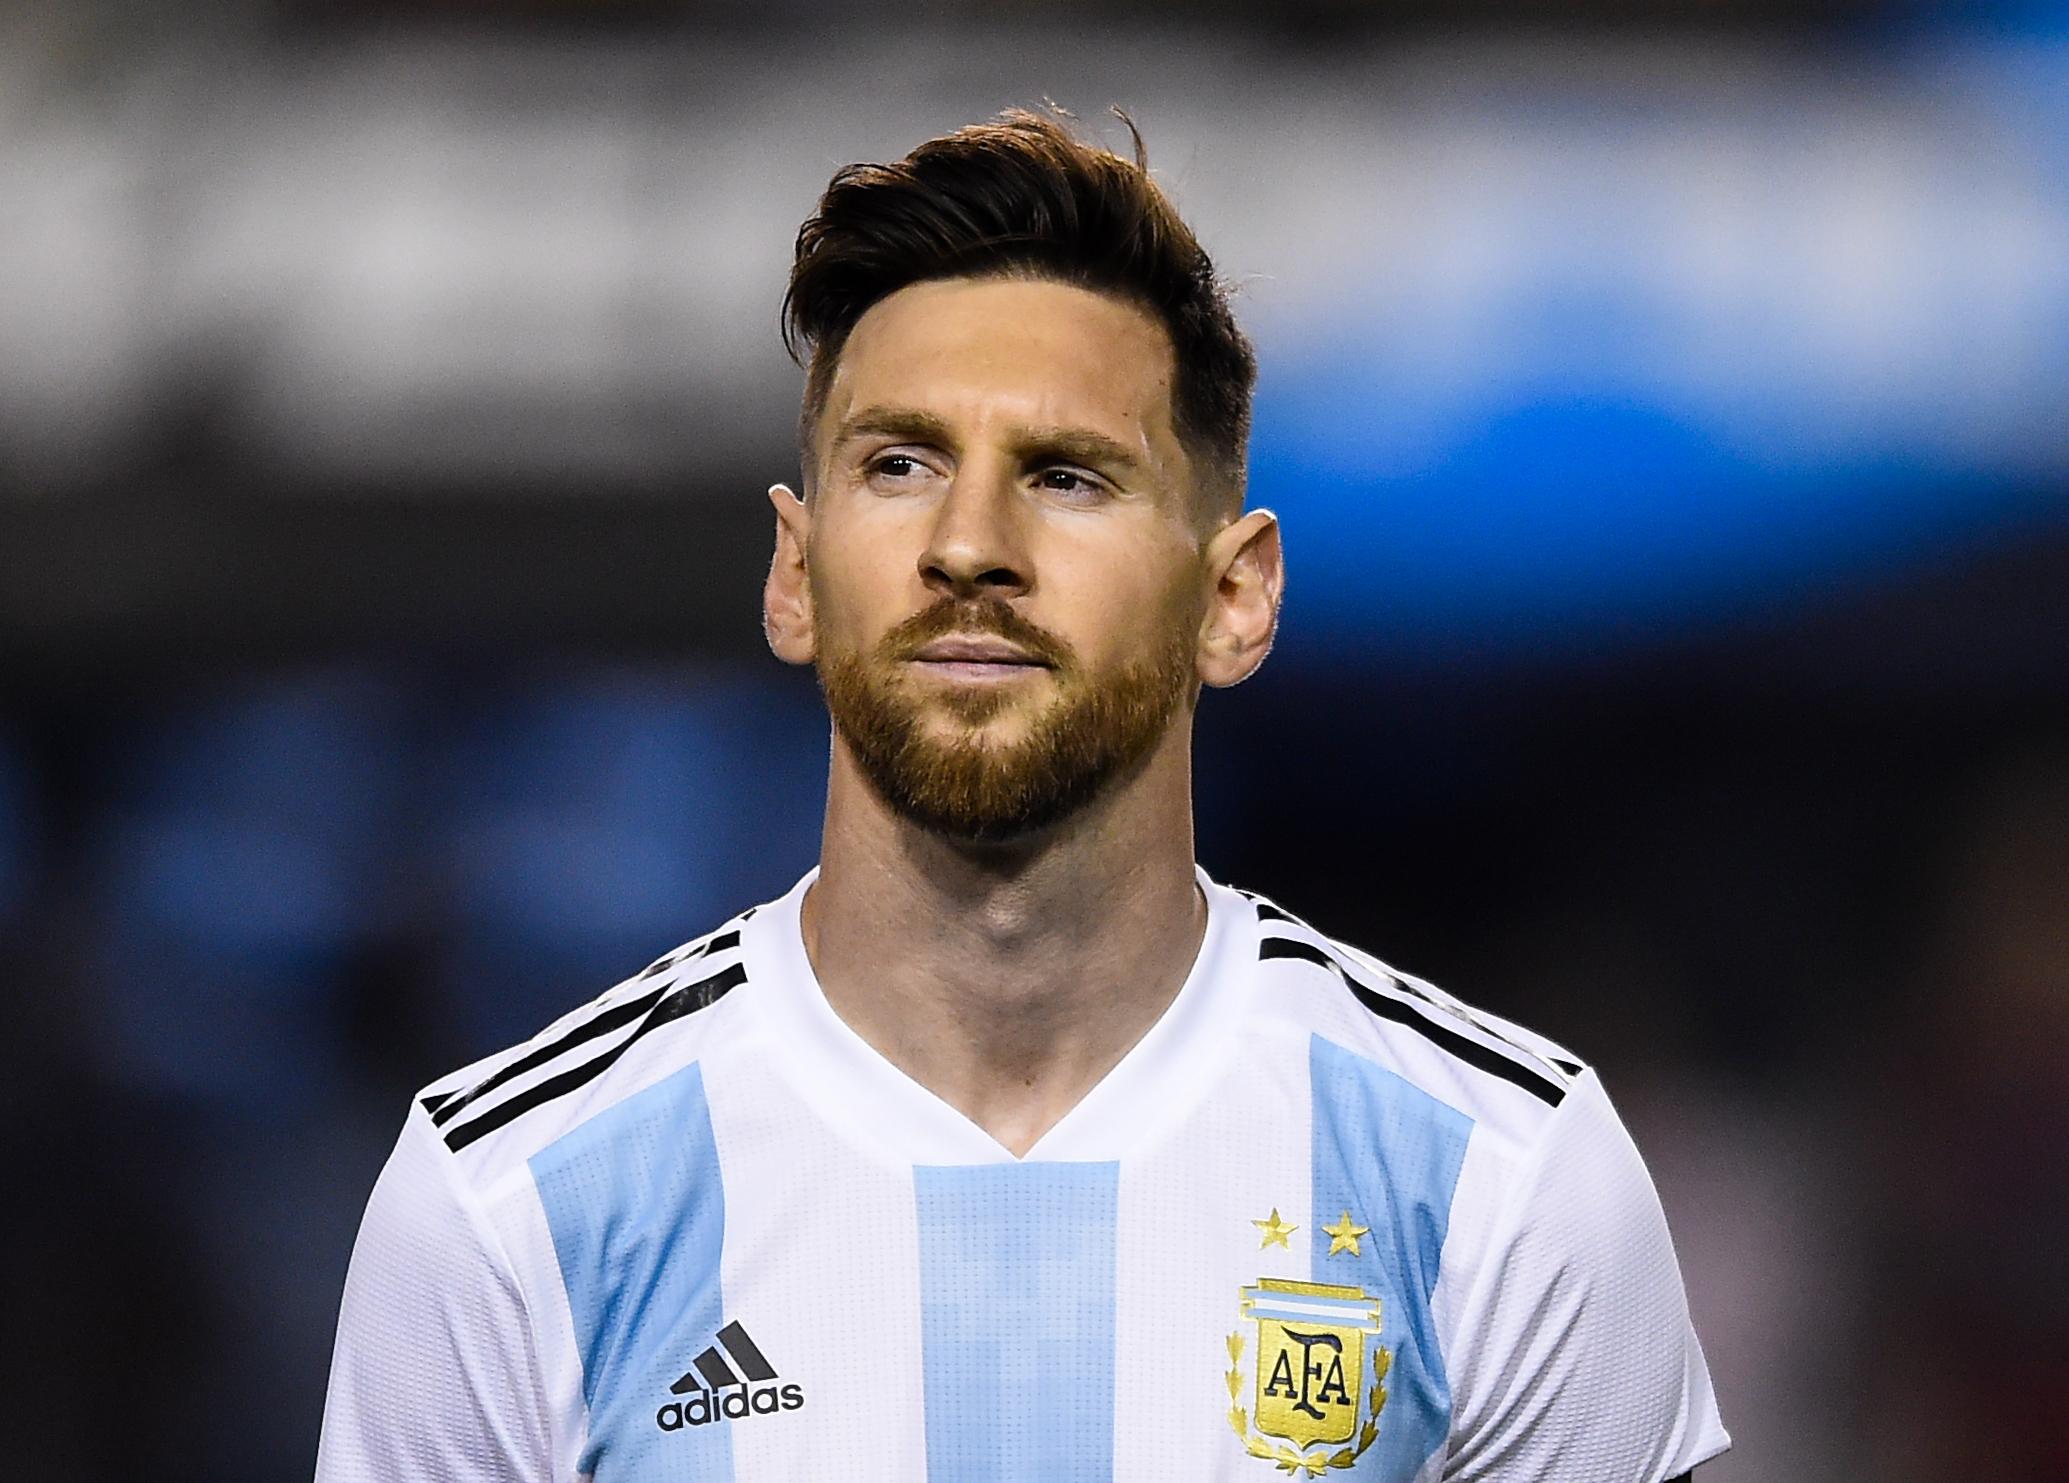 Lionel Messi - Argentina - 2018 World Cup